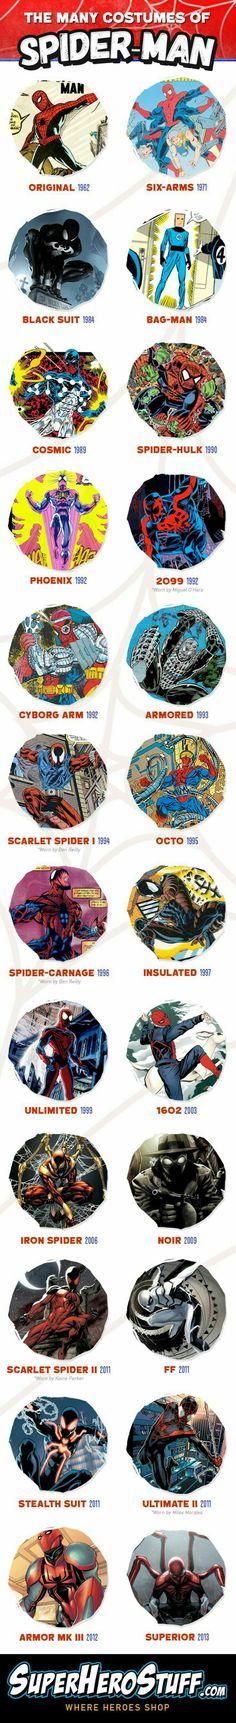 I like the Spider Hulk